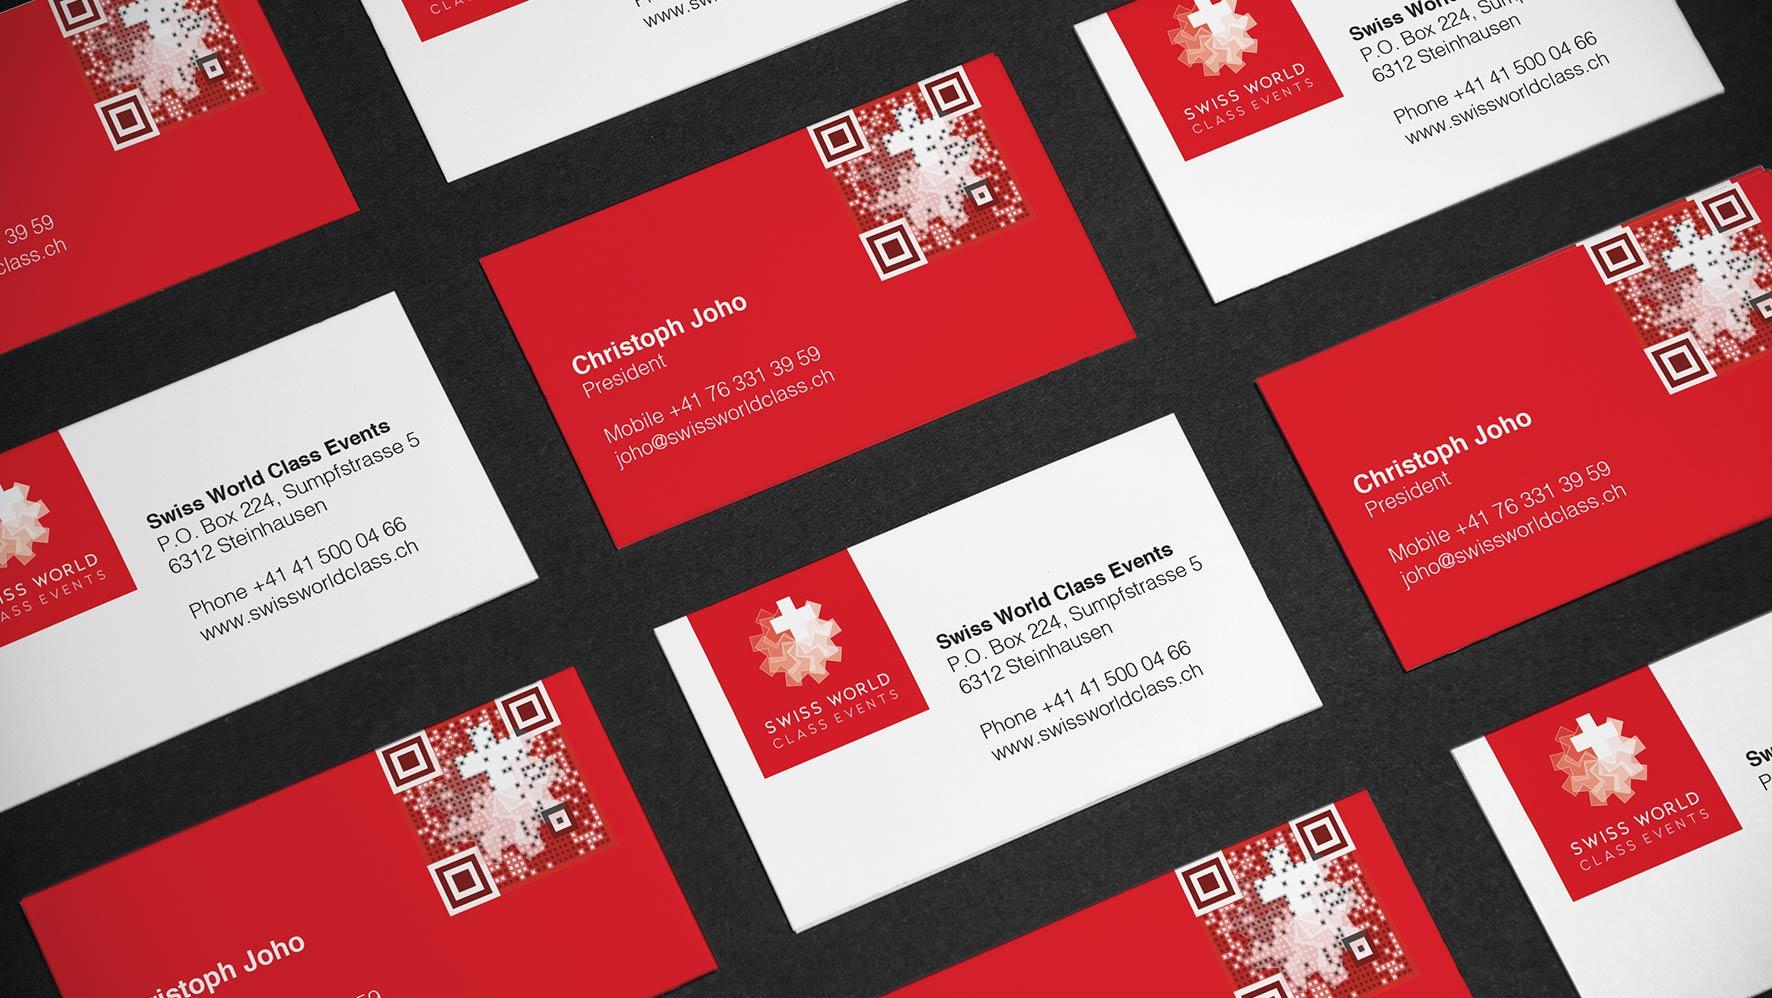 Showcase Top Events of Switzerland